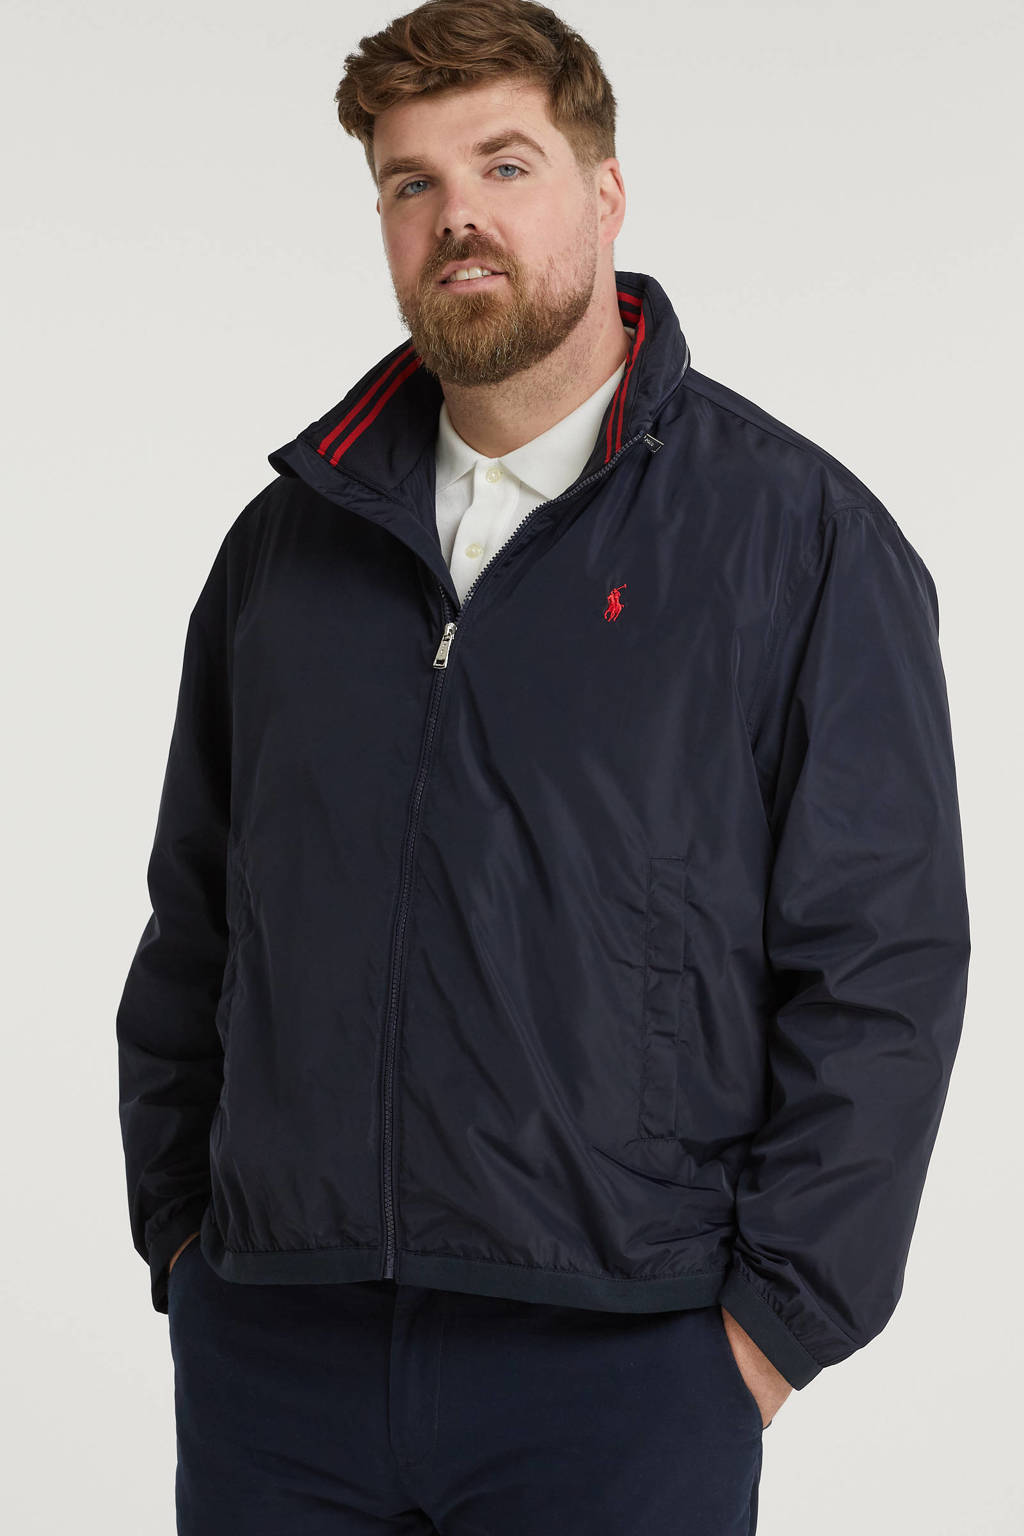 POLO Ralph Lauren Big & Tall +size jack zomer Plus Size donkerblauw, Donkerblauw